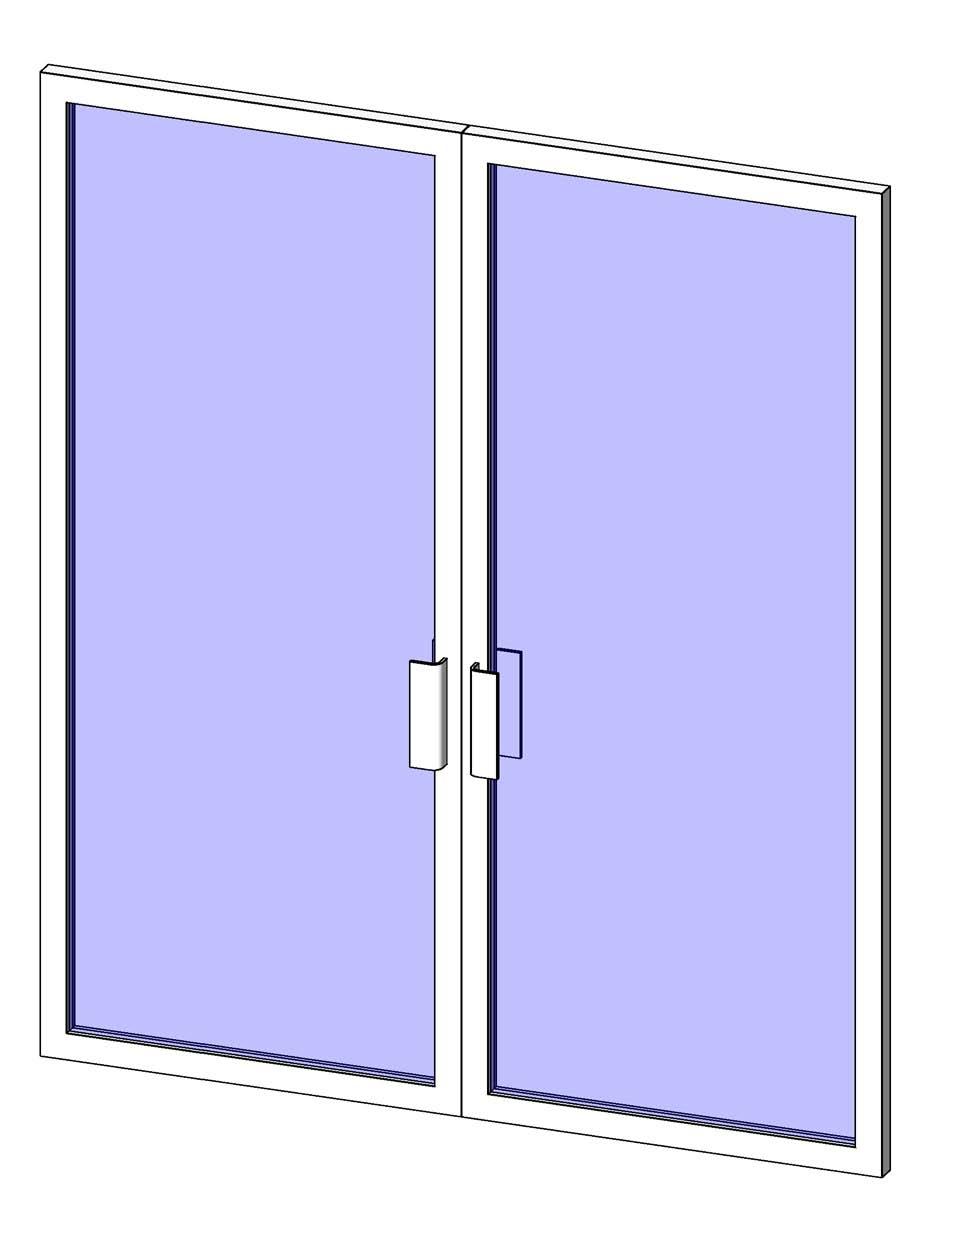 6 1 2 Sips Curtain Wall : Curtain wall sliding door revit family glif